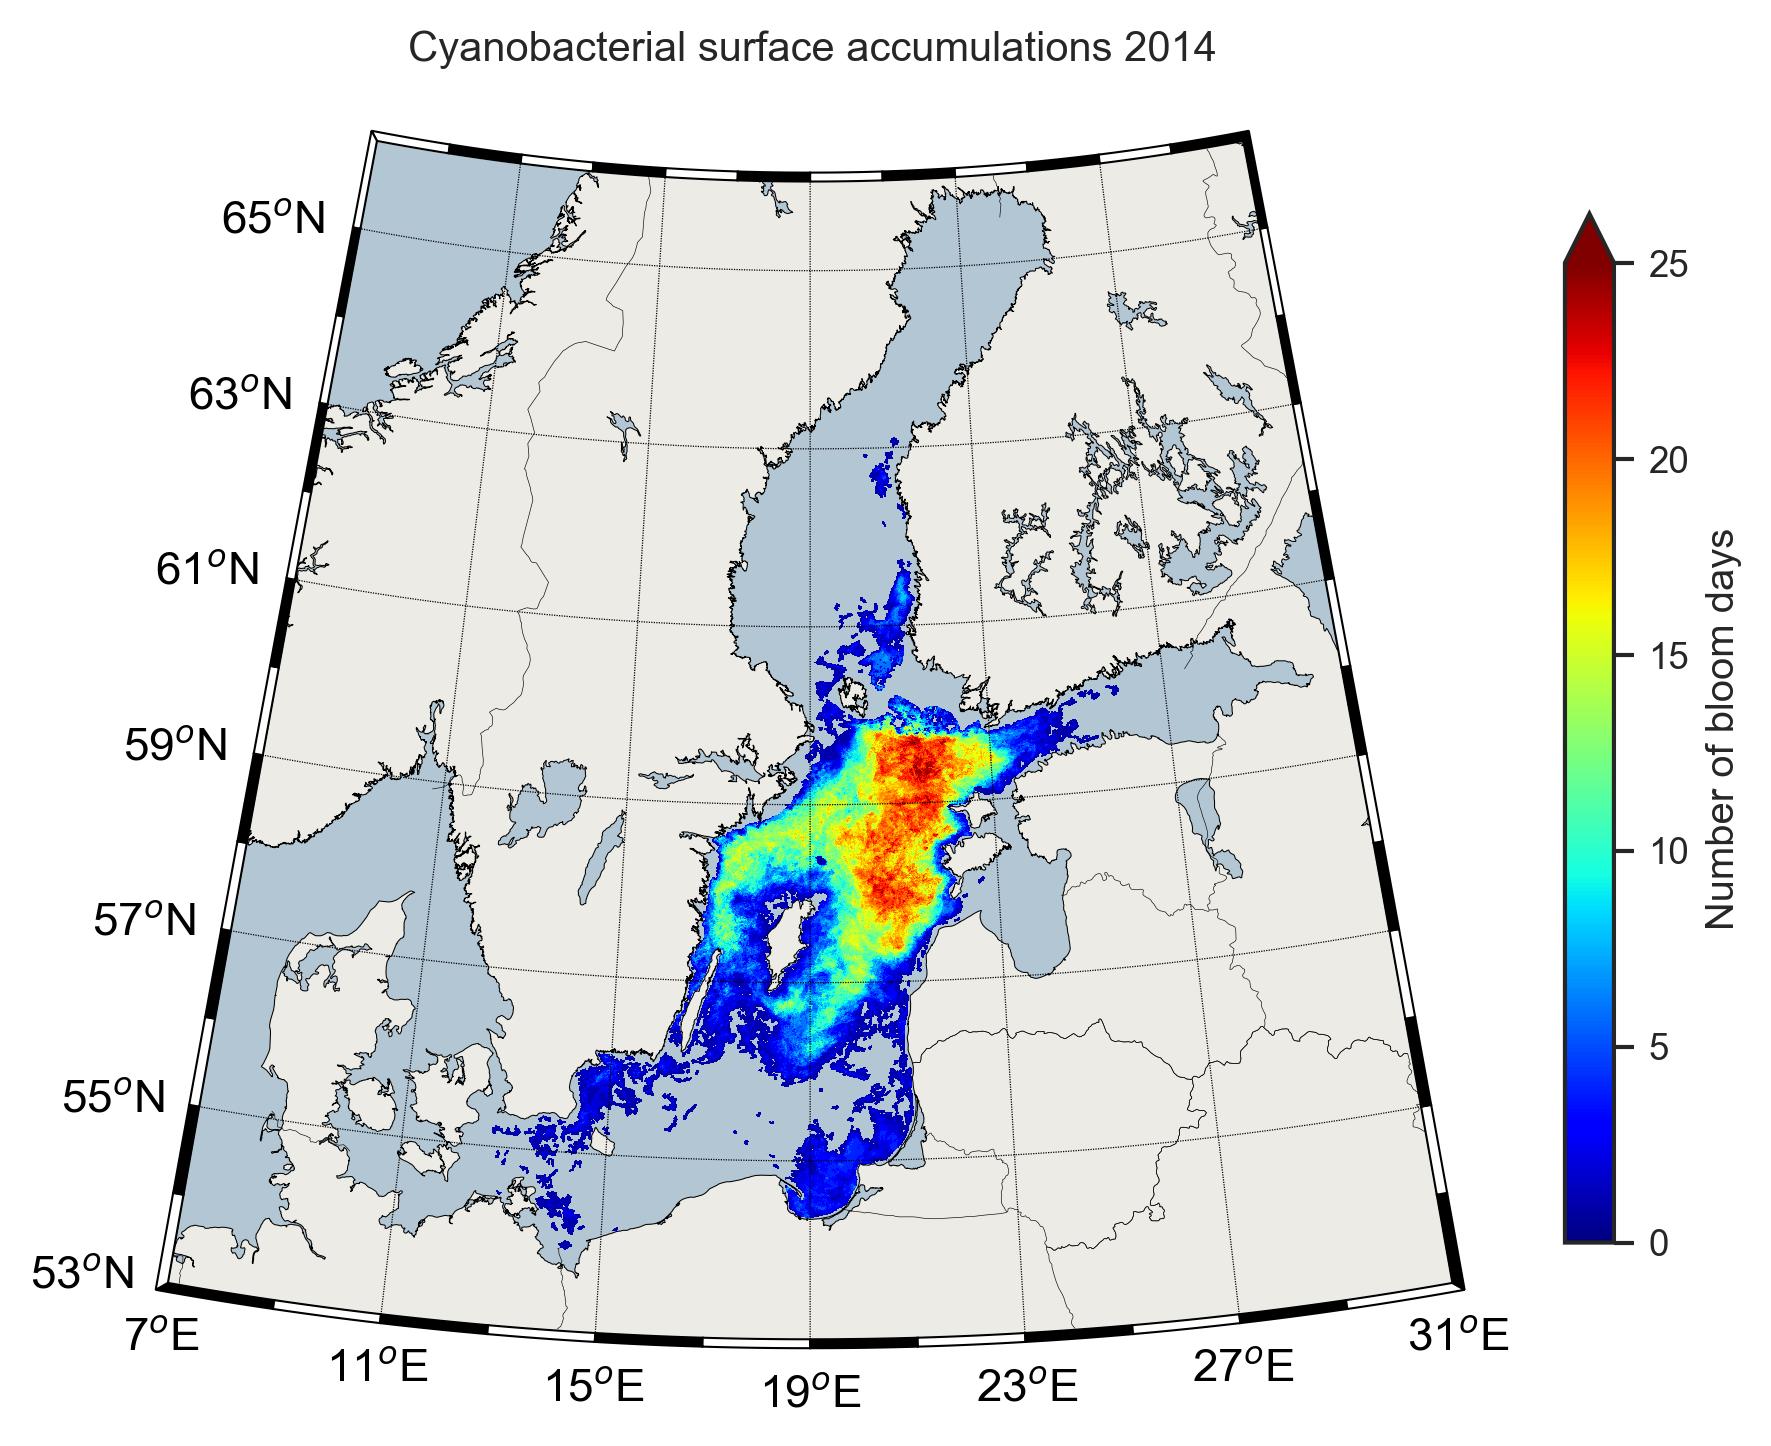 Karta över cyanobakterier 2014